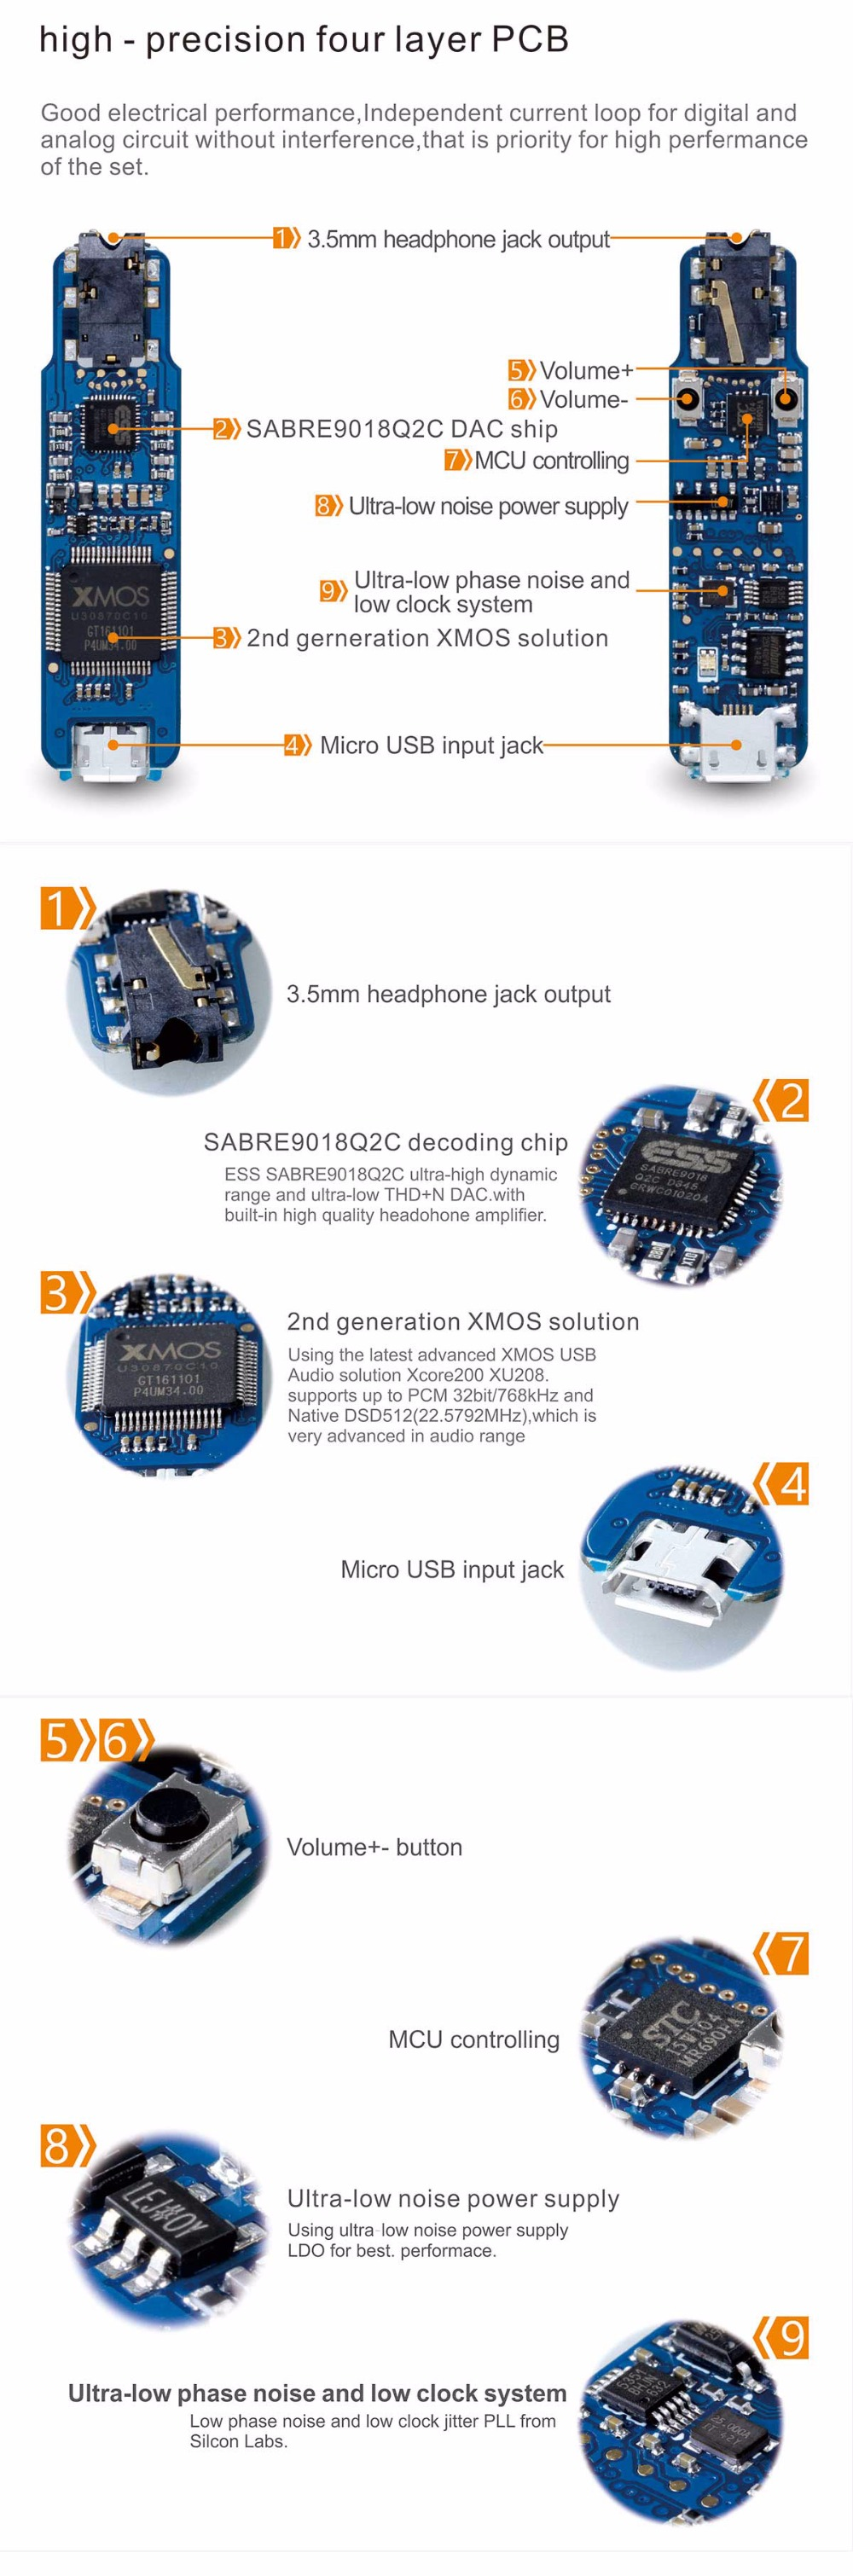 NEW SMSL IDEA SABRE9018Q2C XMOS DSD512 Hifi Audio Portable USB DAC and headphone amplifier 3.5mm headphone jack output